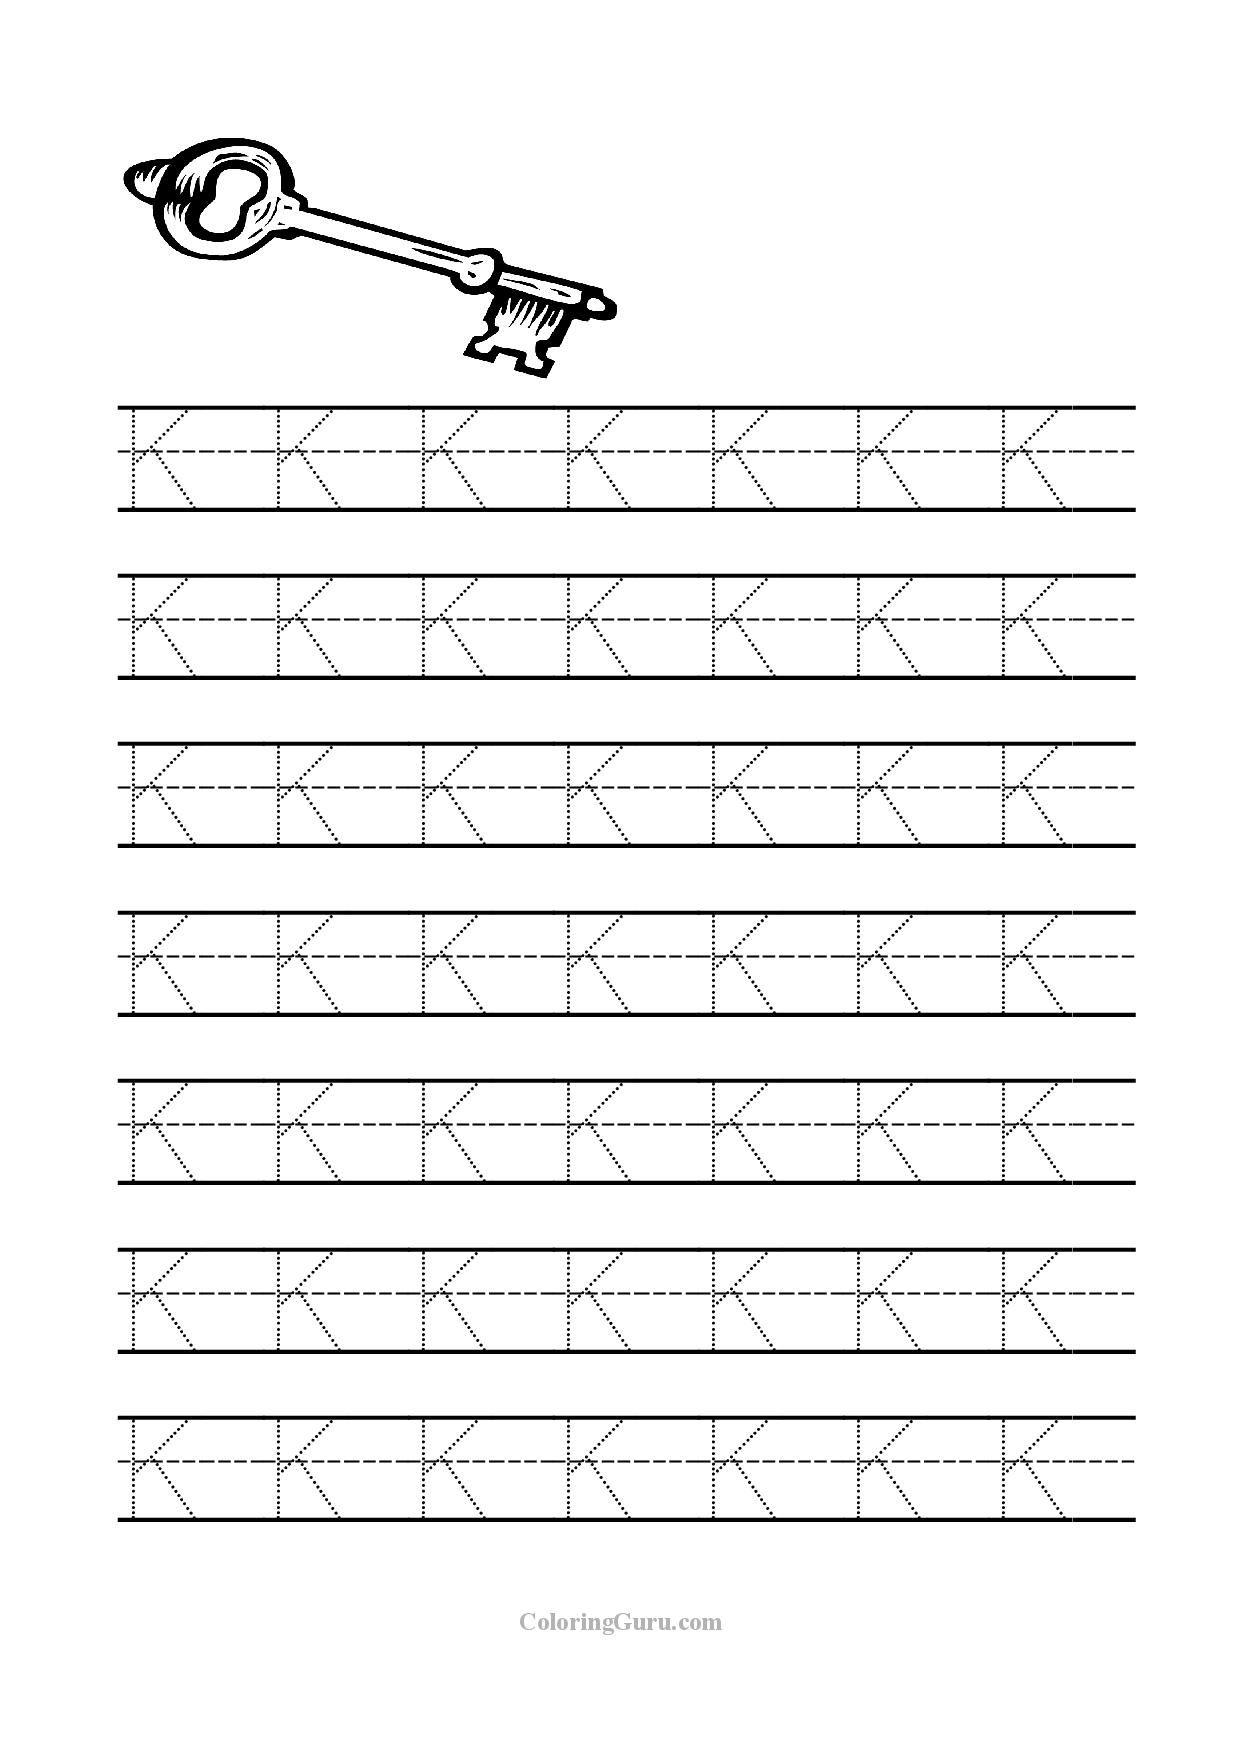 Free Printable Tracing Letter K Worksheets For Preschool   Kids - Free Printable Letter K Worksheets